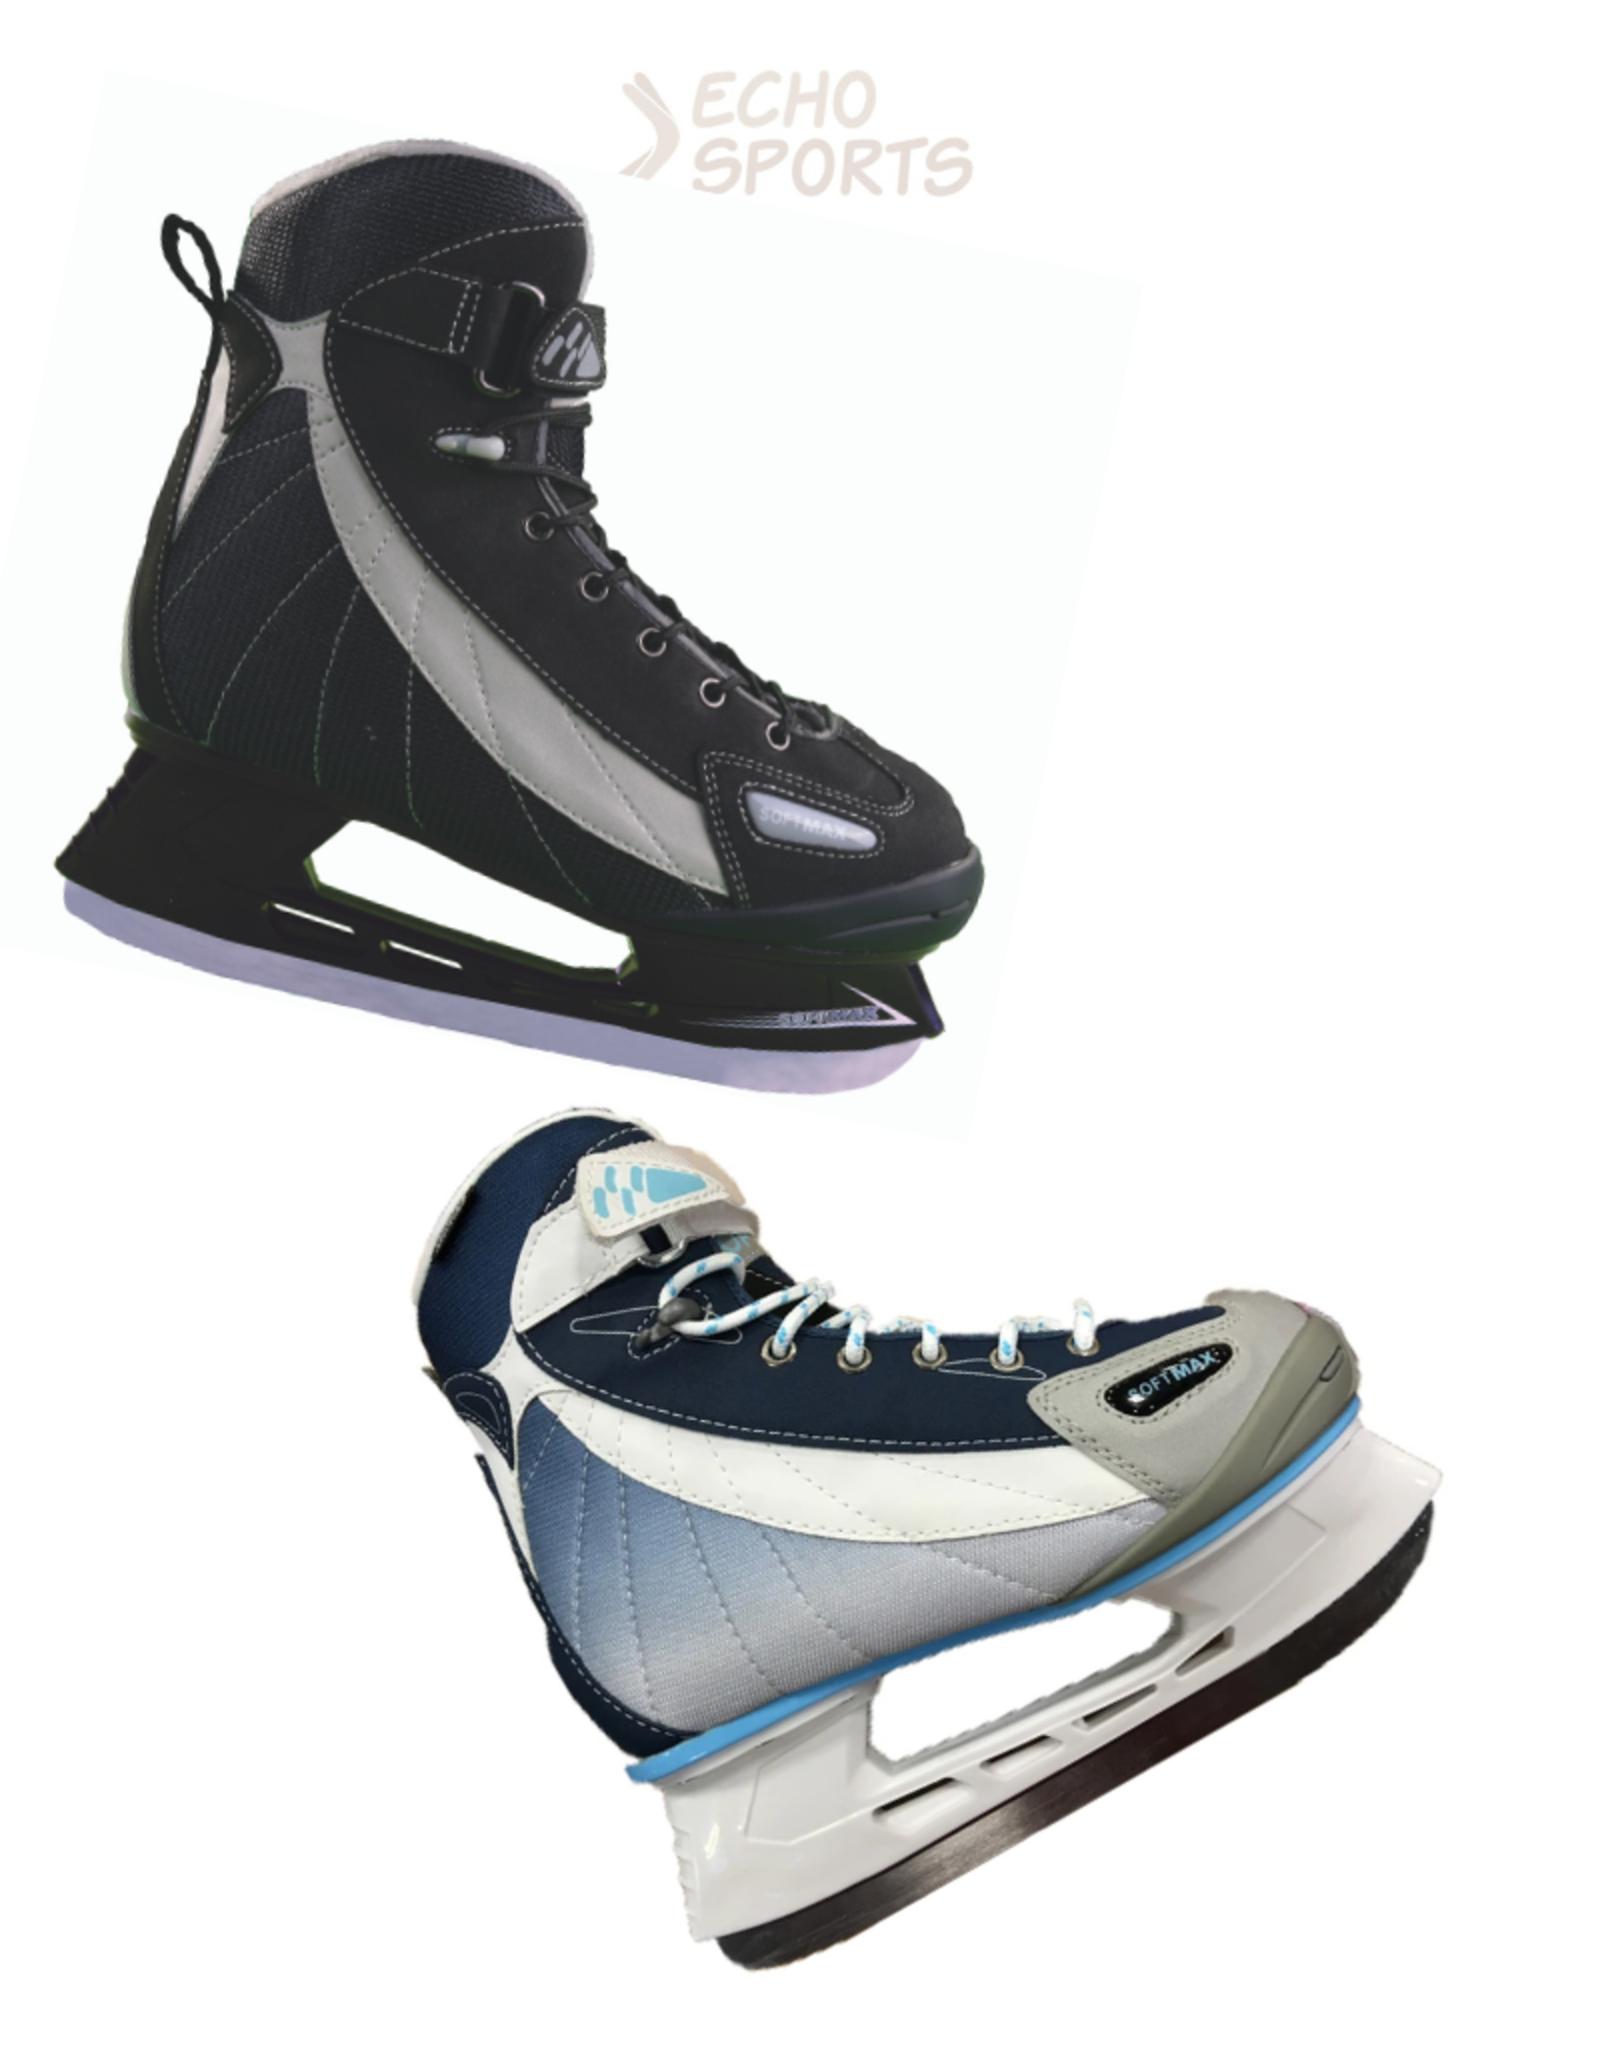 Recreational skates Softmax S-957